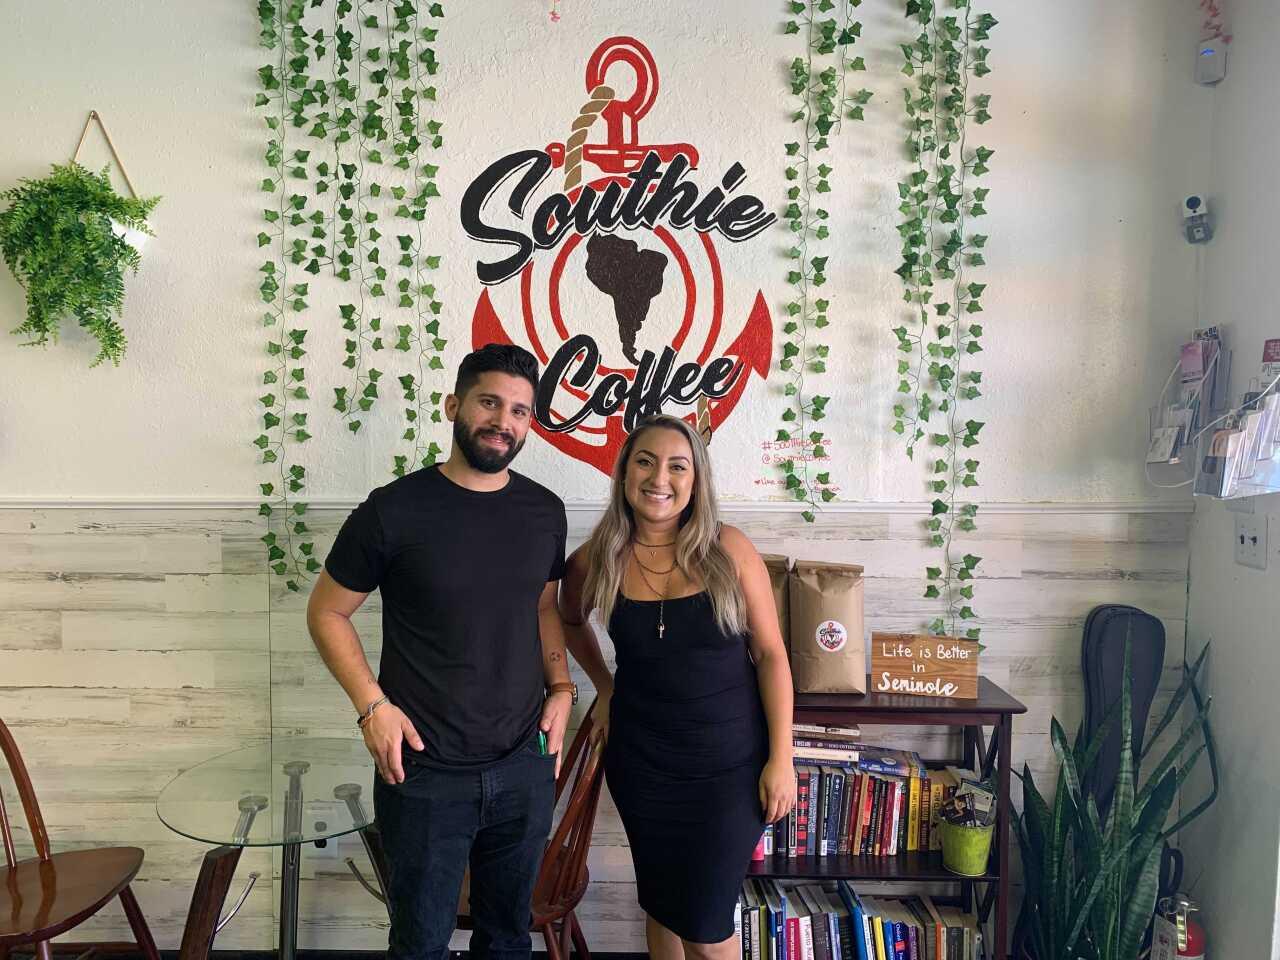 southie coffee-coffee shop (1).jpg